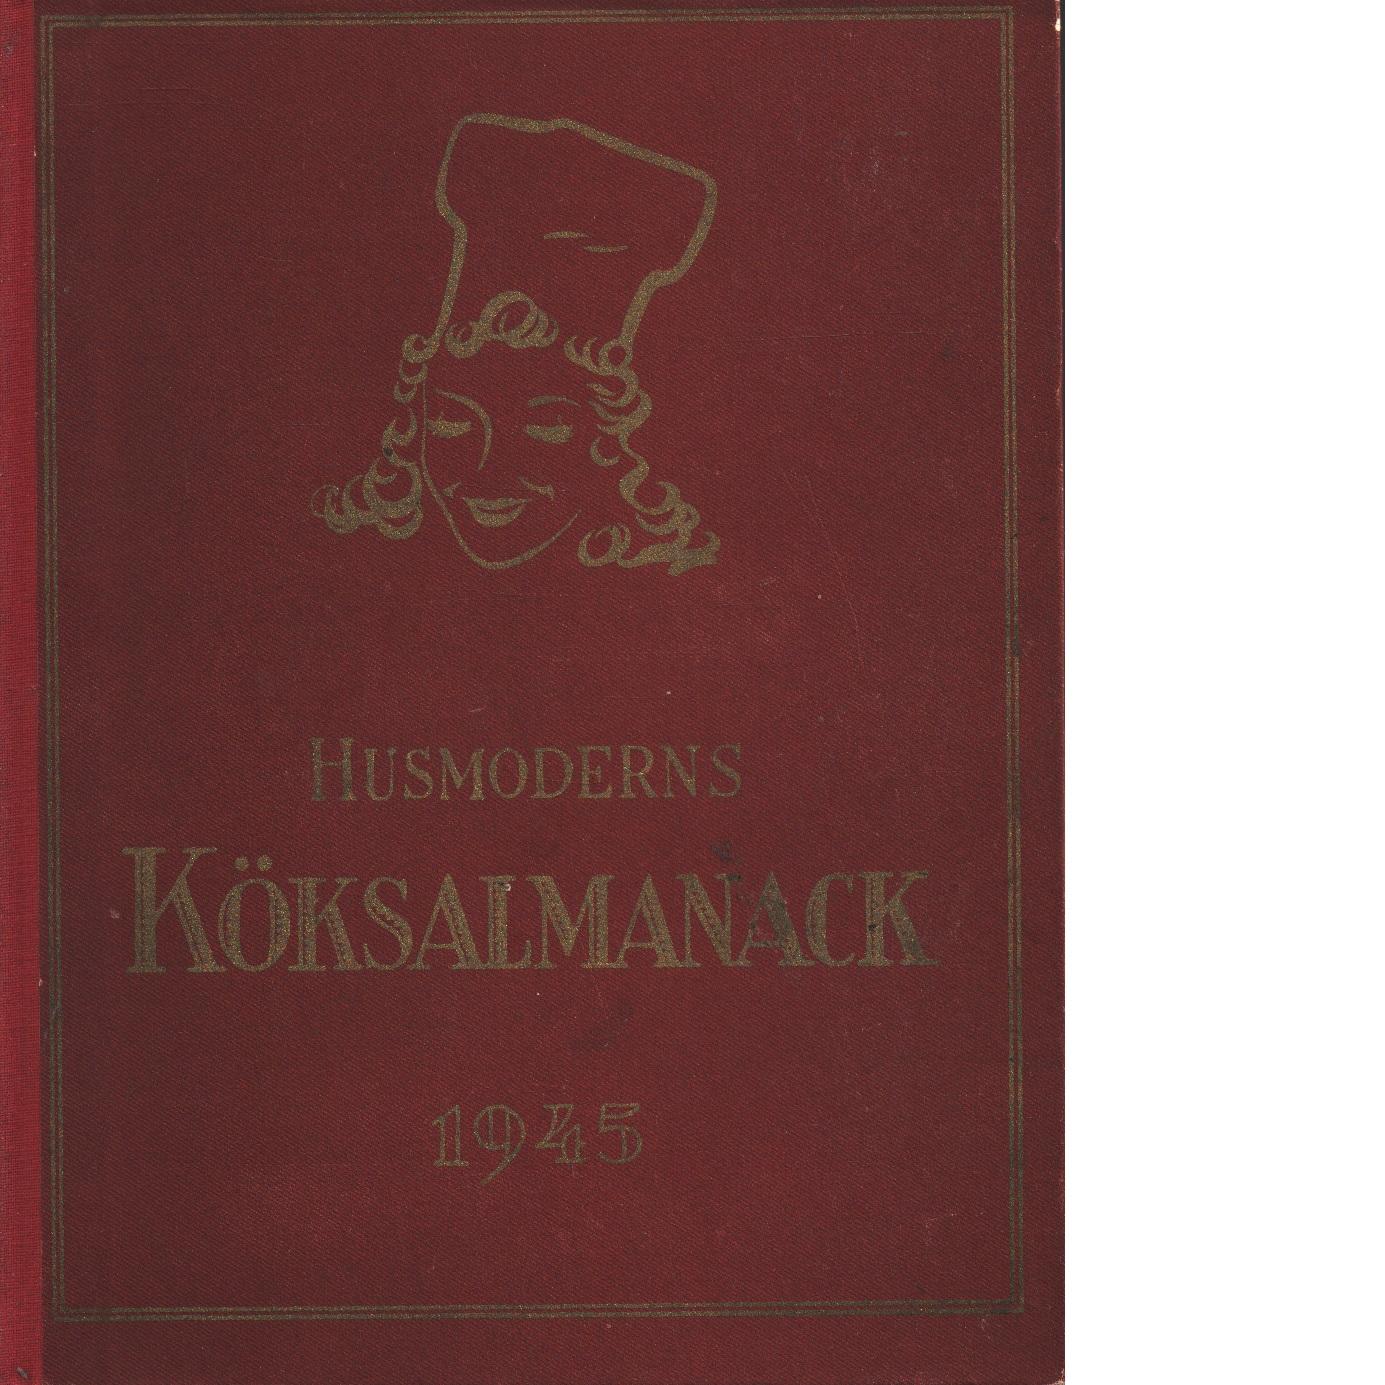 Husmoderns köksalmanack 1945 - Red.